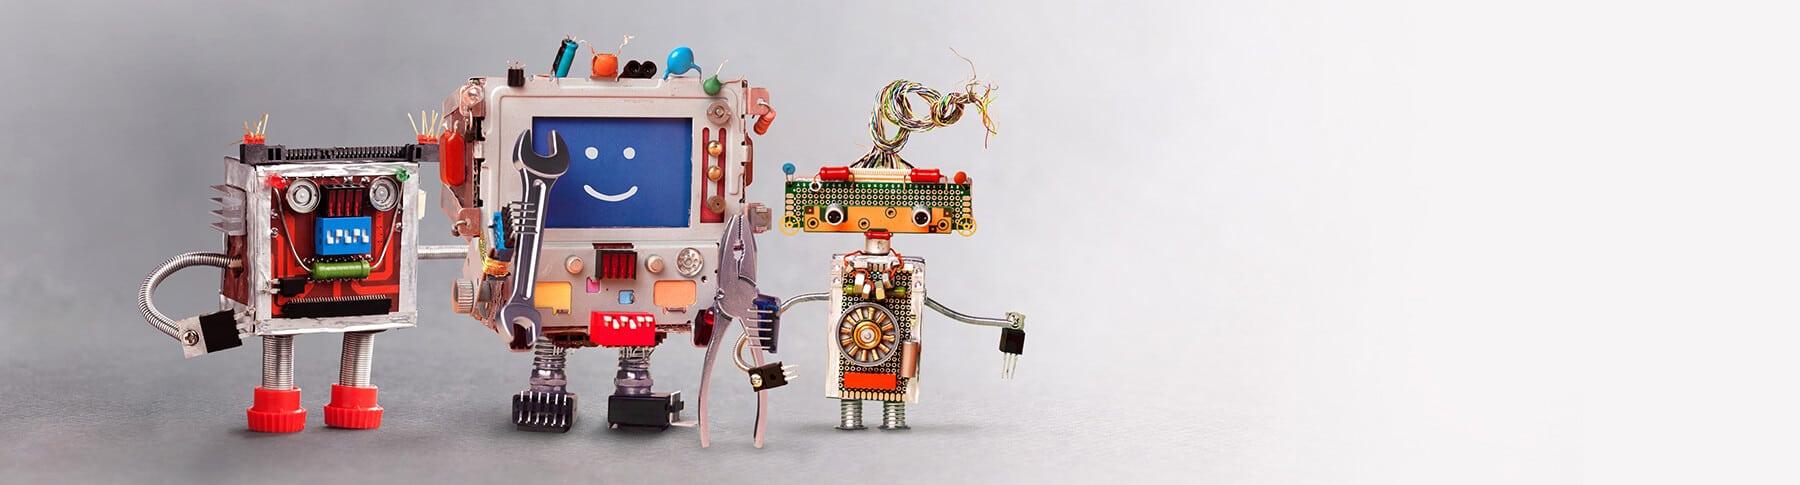 metas robots tags